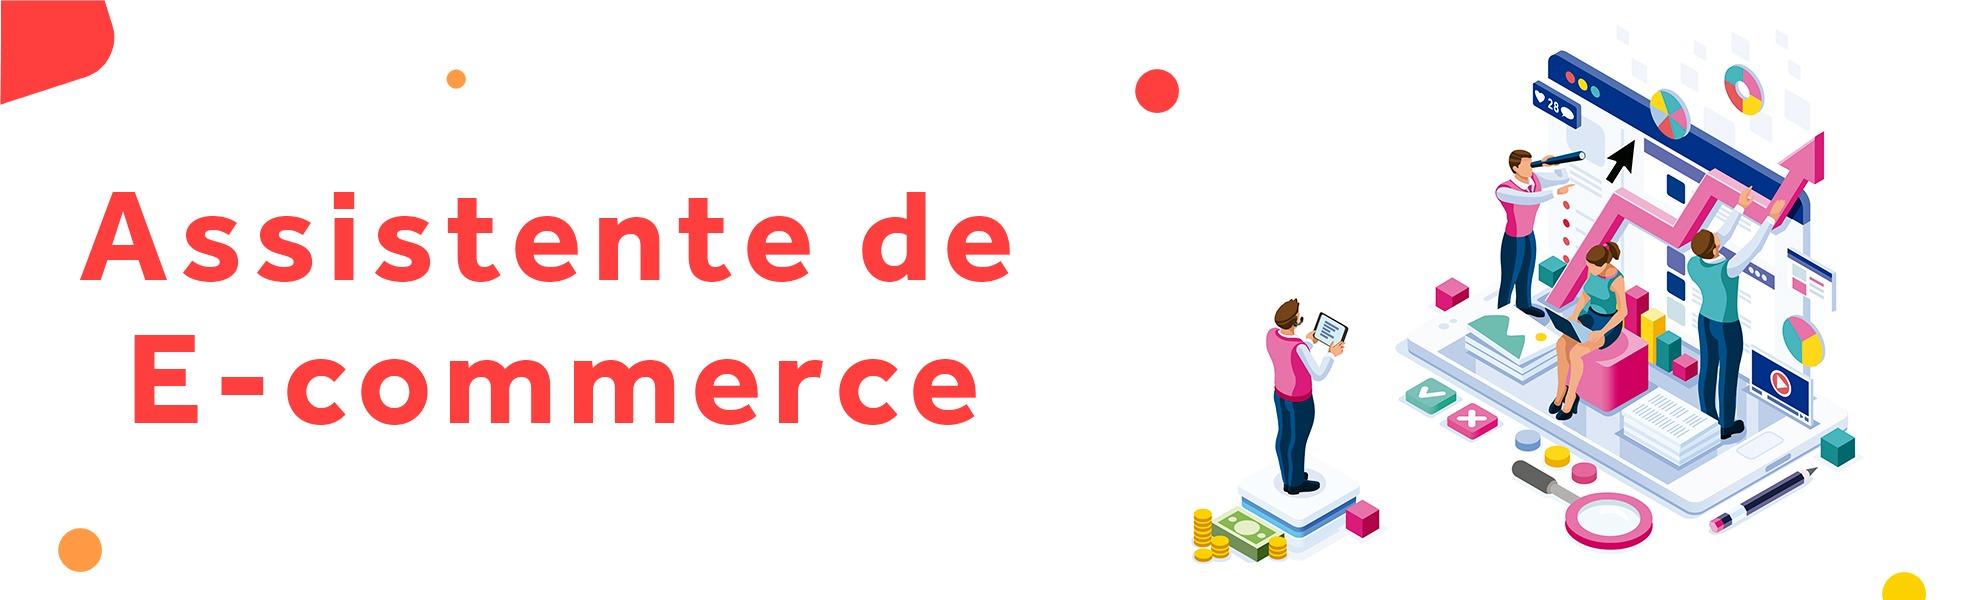 Assistente de E-commerce